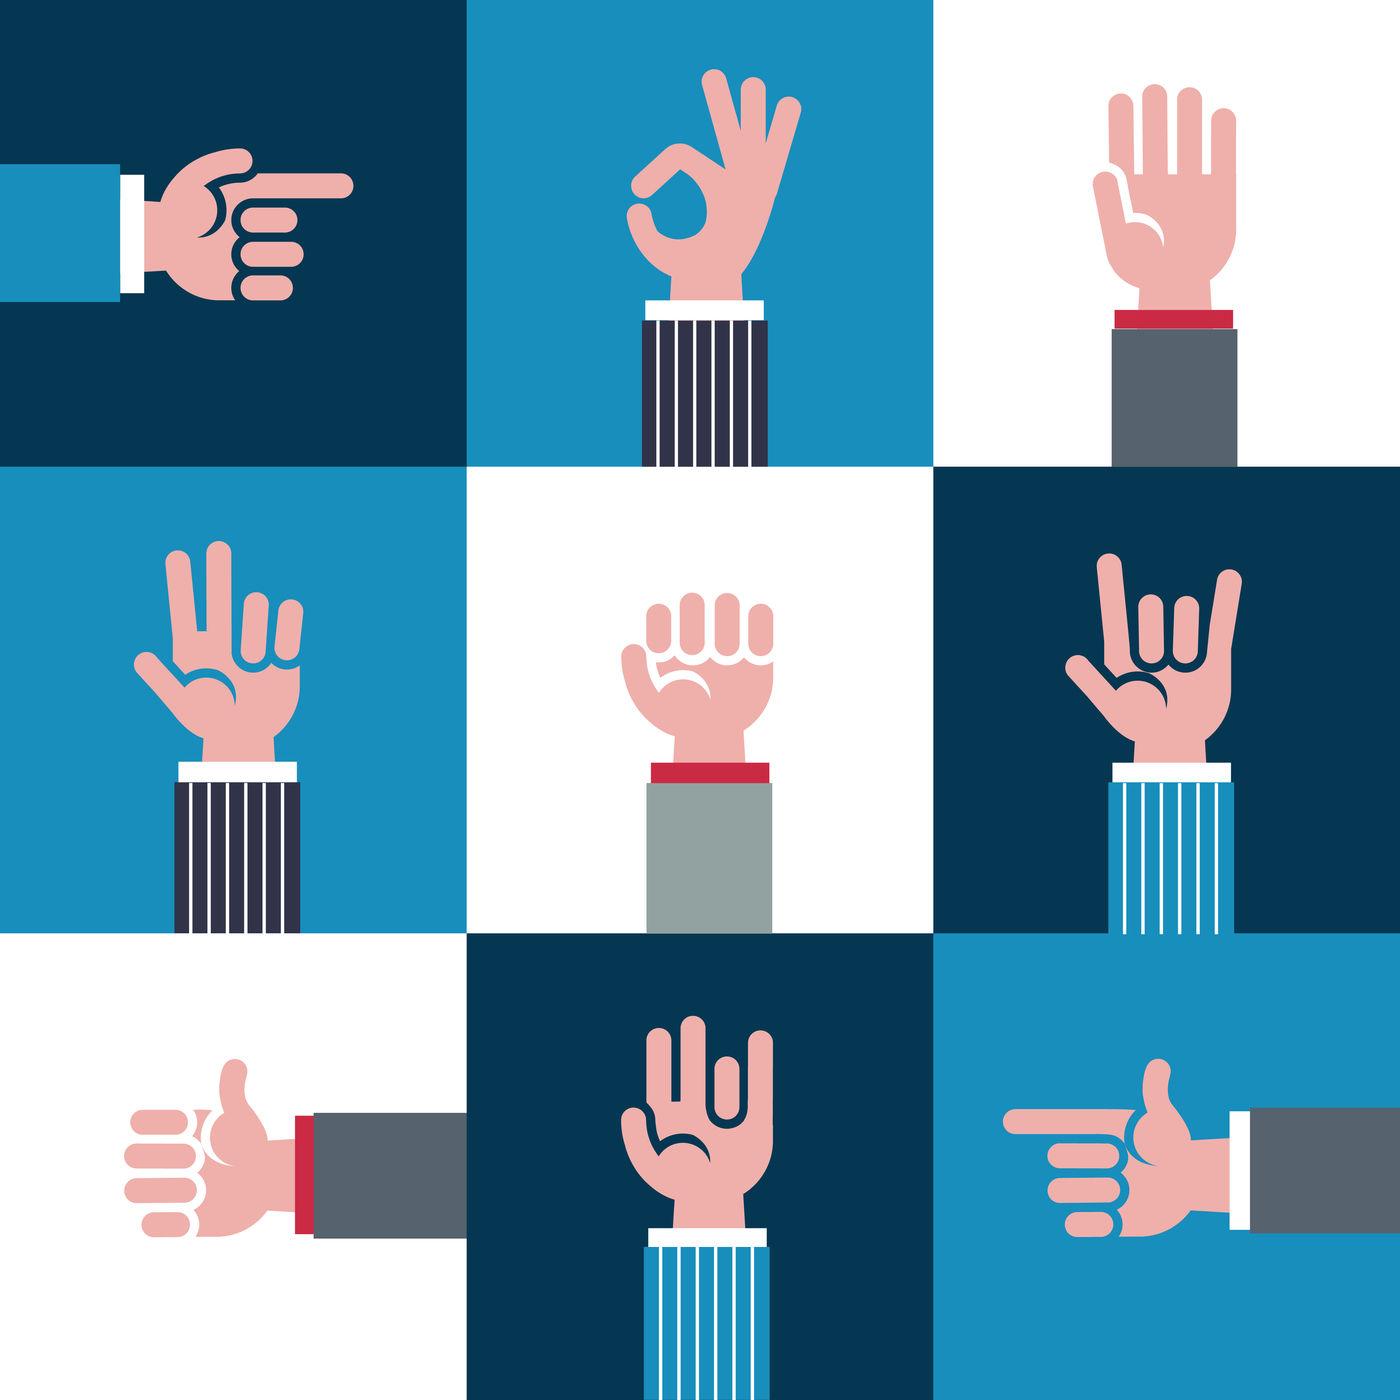 Vector Icons And Symbols Emoji Different Hands Gestures Signals